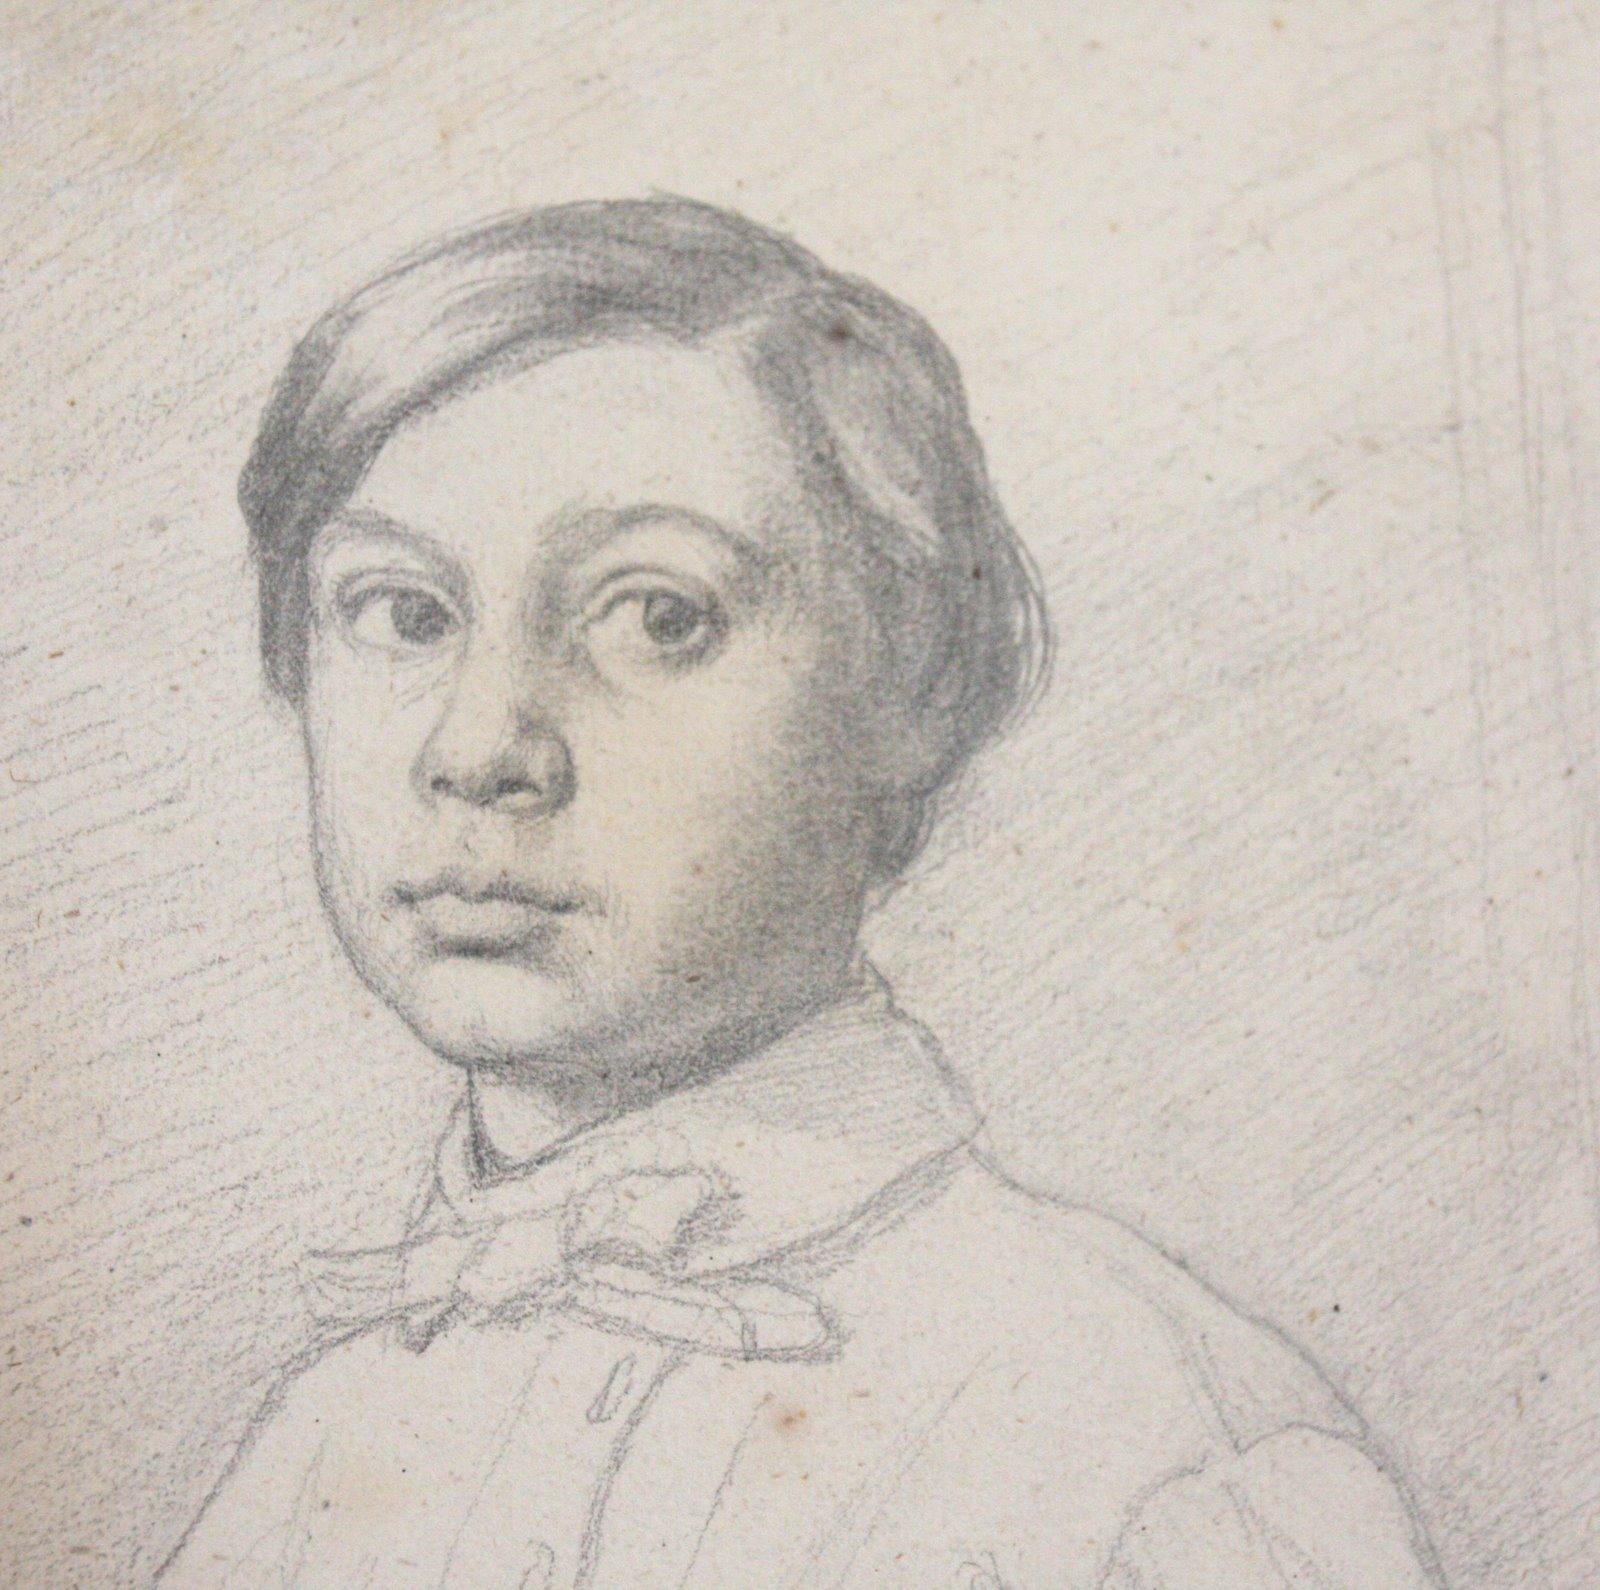 Drawn portrait degas Degas drawings portraits Google degas